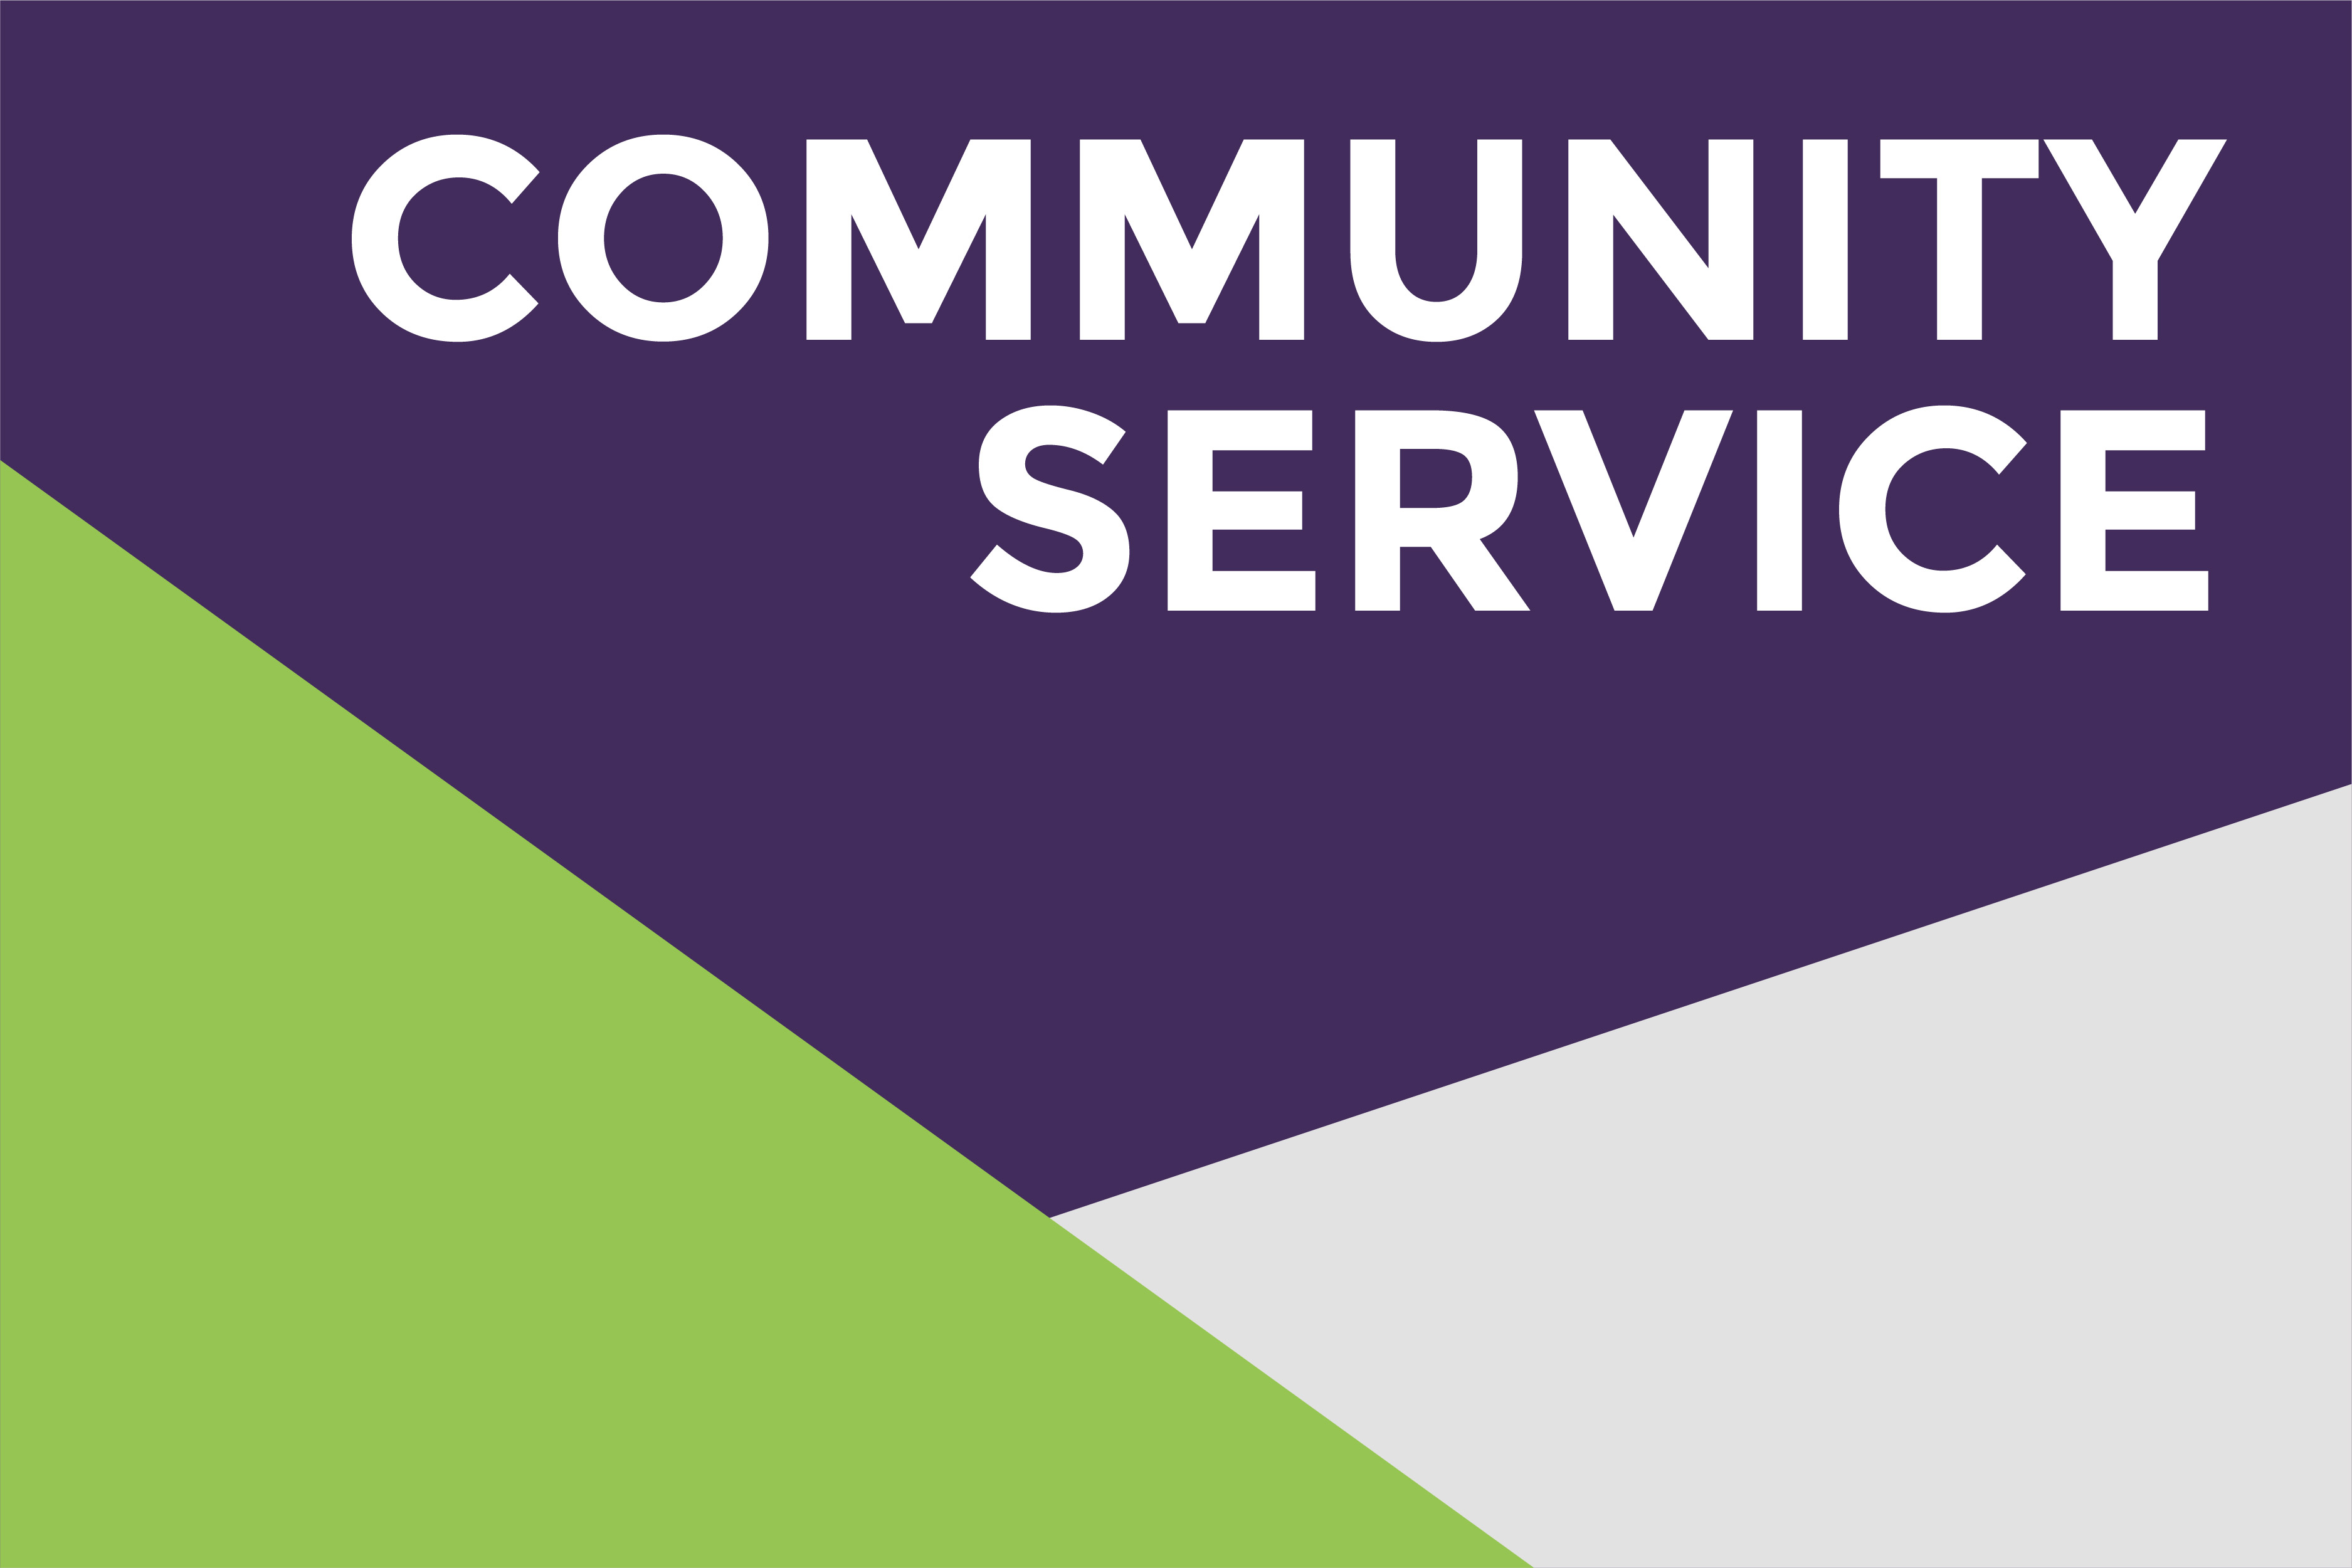 Community Service at UW-Whitewater